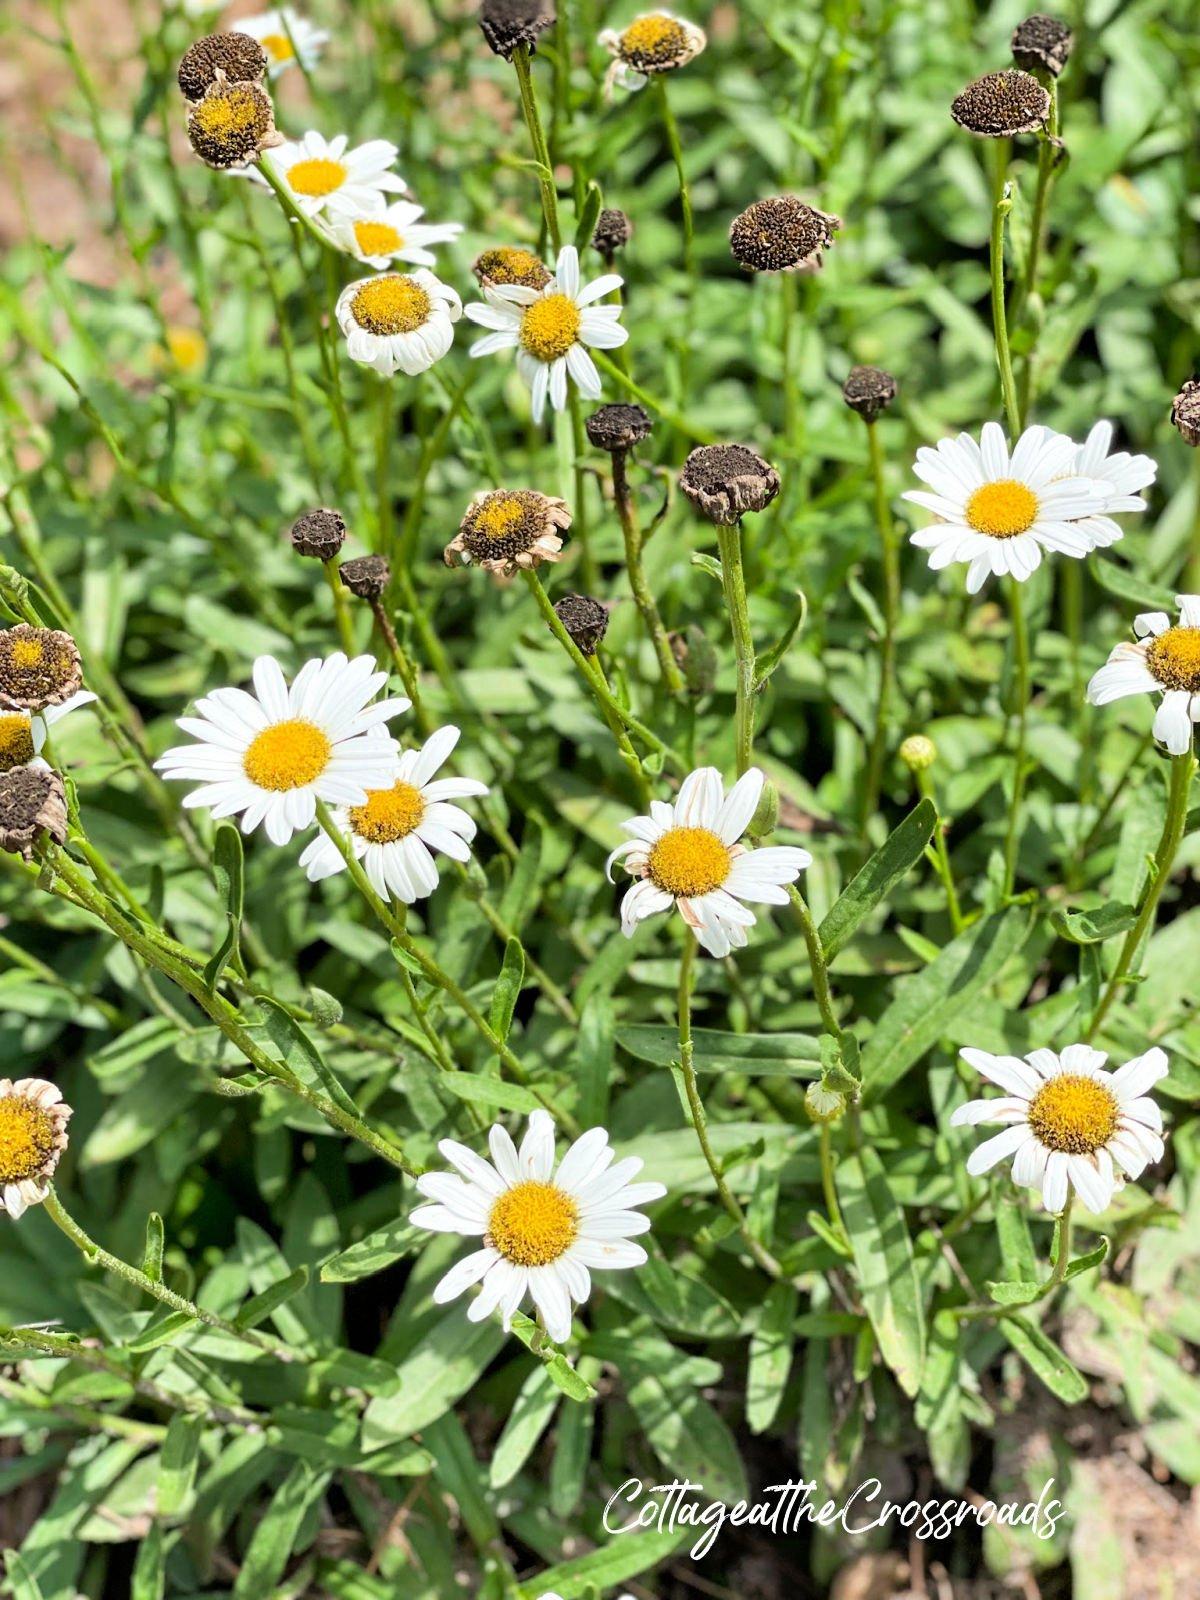 Shasta daisy blooms